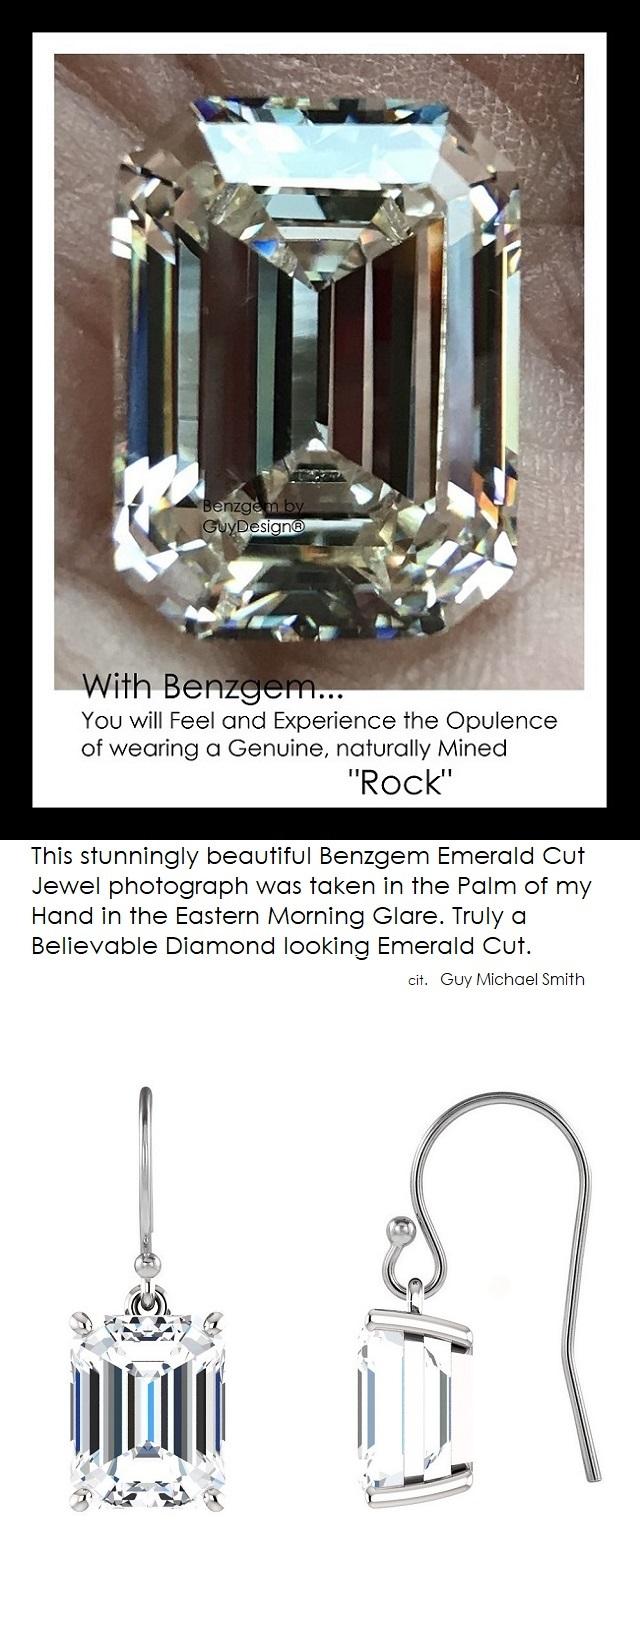 55658.2-emerald-shape-3.95-carat-benzgem-7.90-total-carats-dangle-earrings.jpg